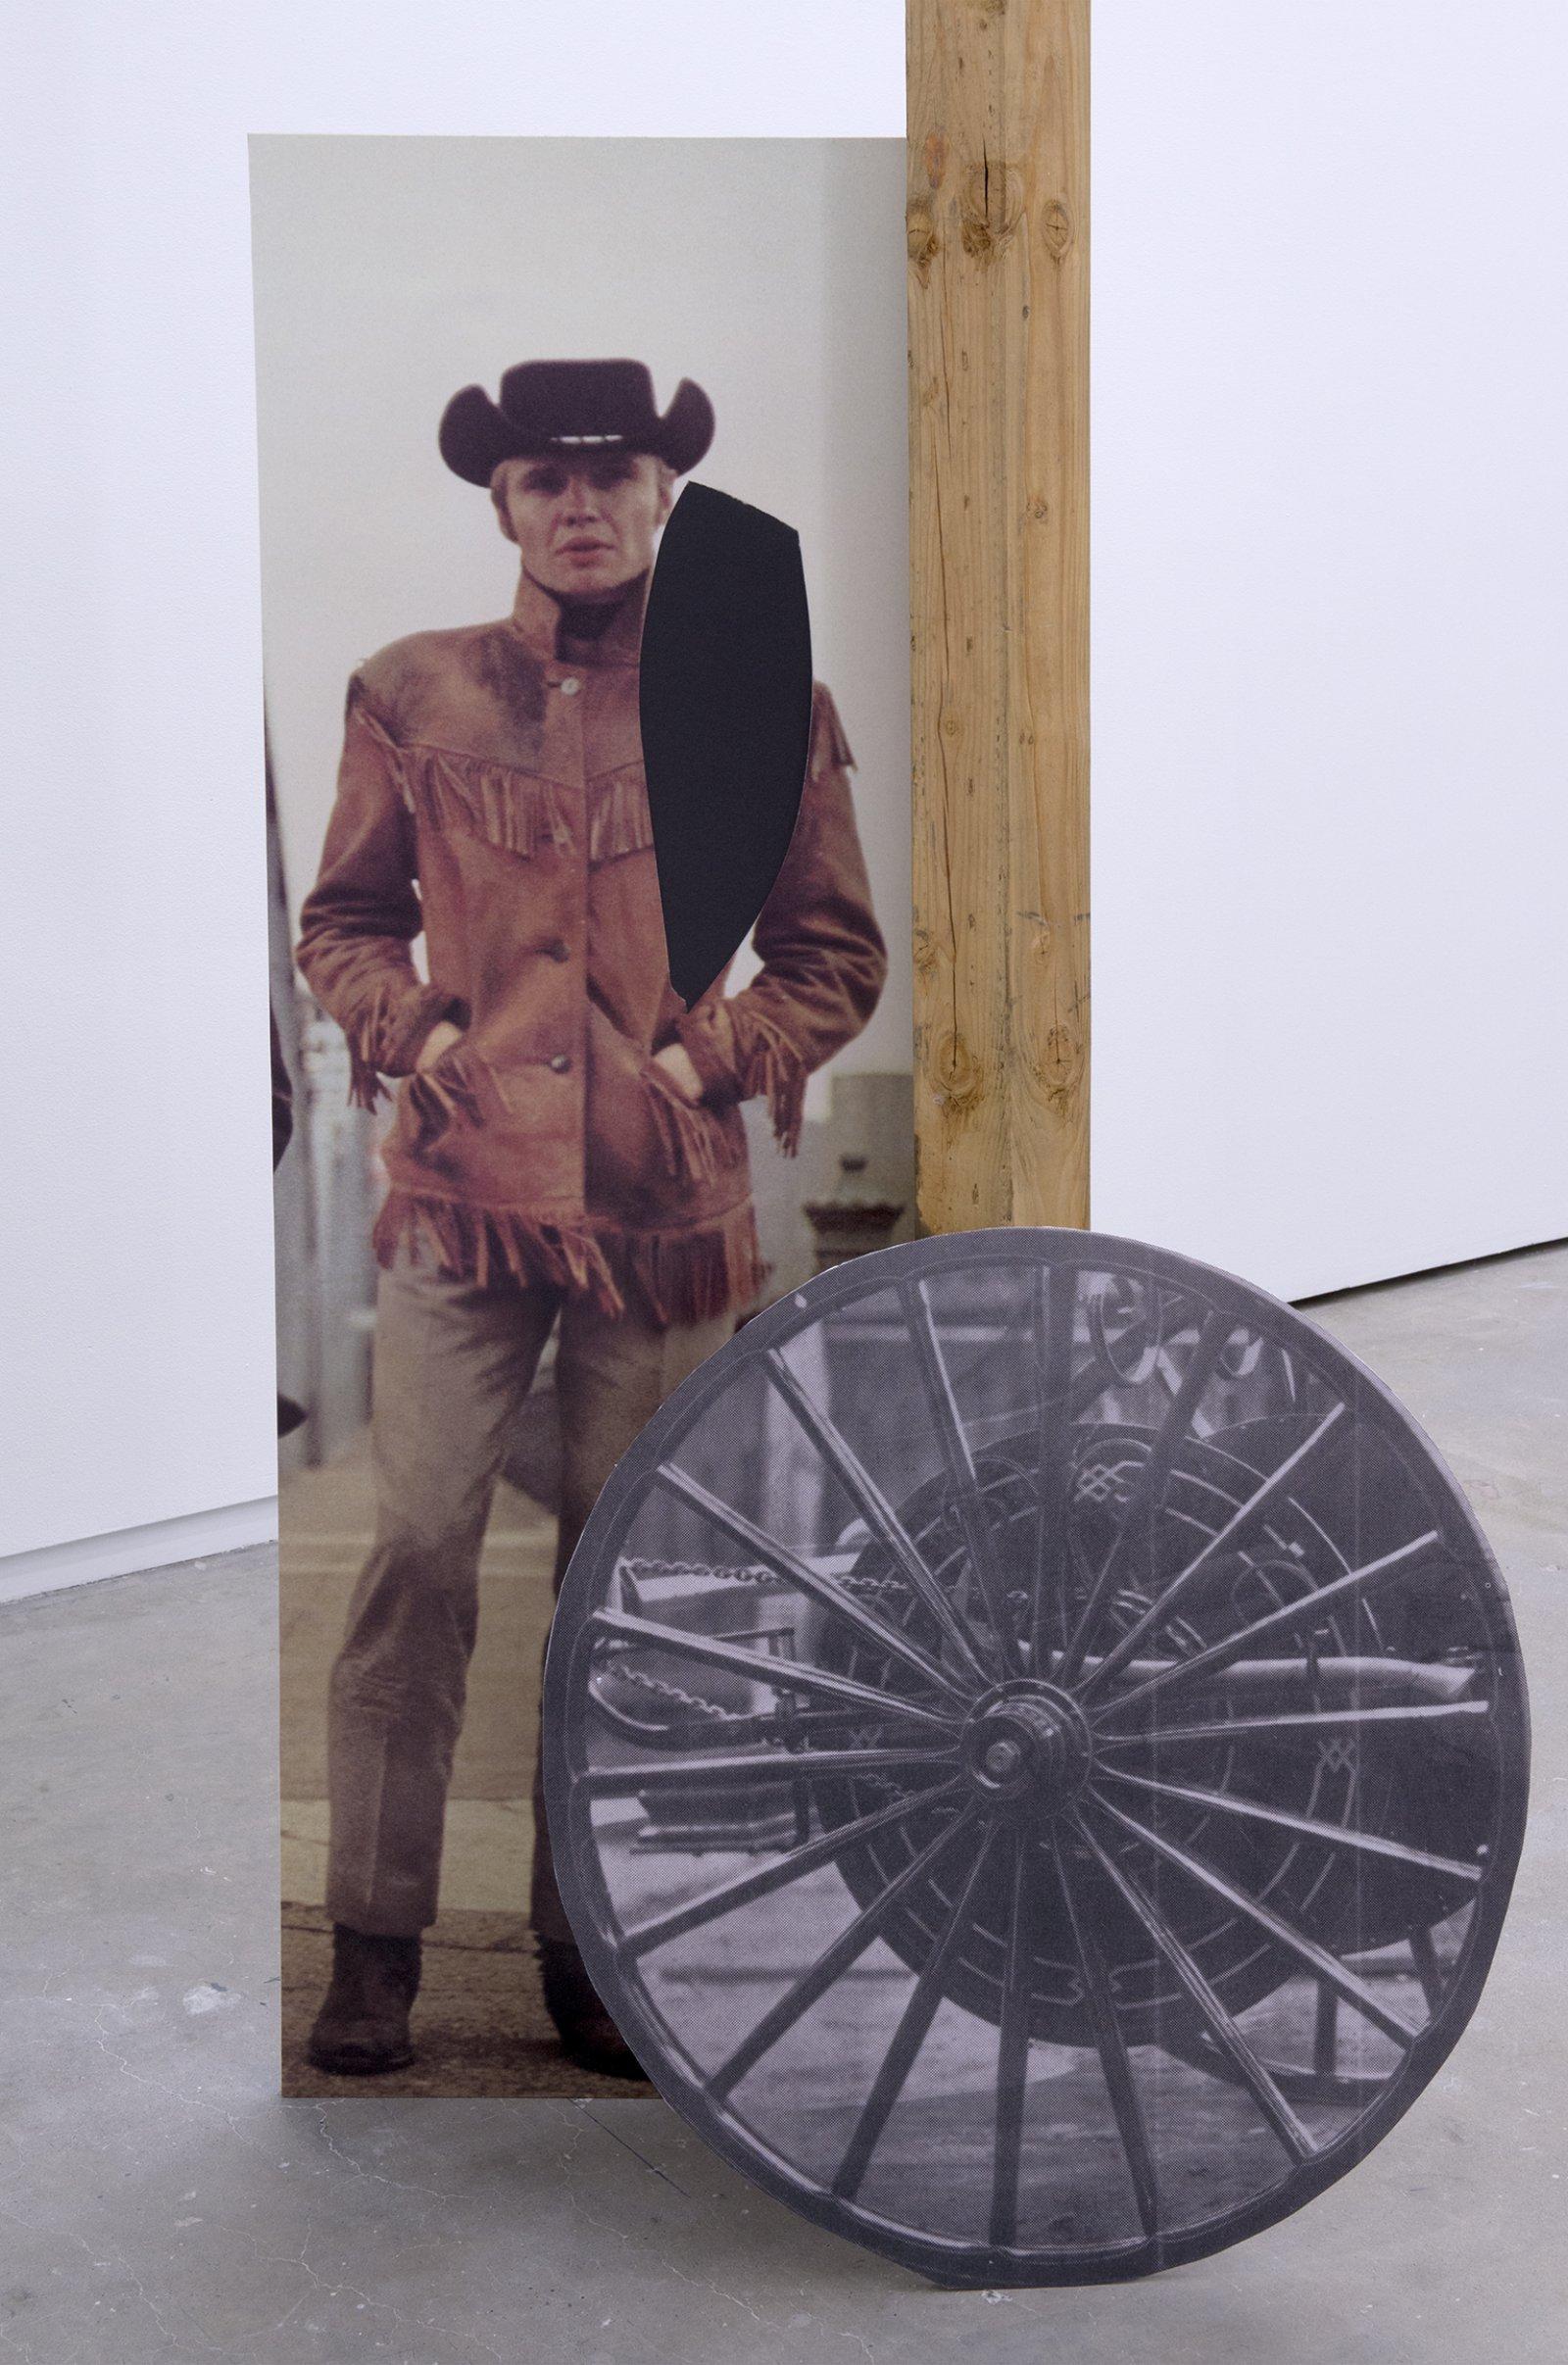 Geoffrey Farmer,Some kinds of sacrifice (detail), 2014, douglas fir pole, 6 photographs mounted on foamcore, 200 x 4 x 4 in. (508 x9 x 9 cm)